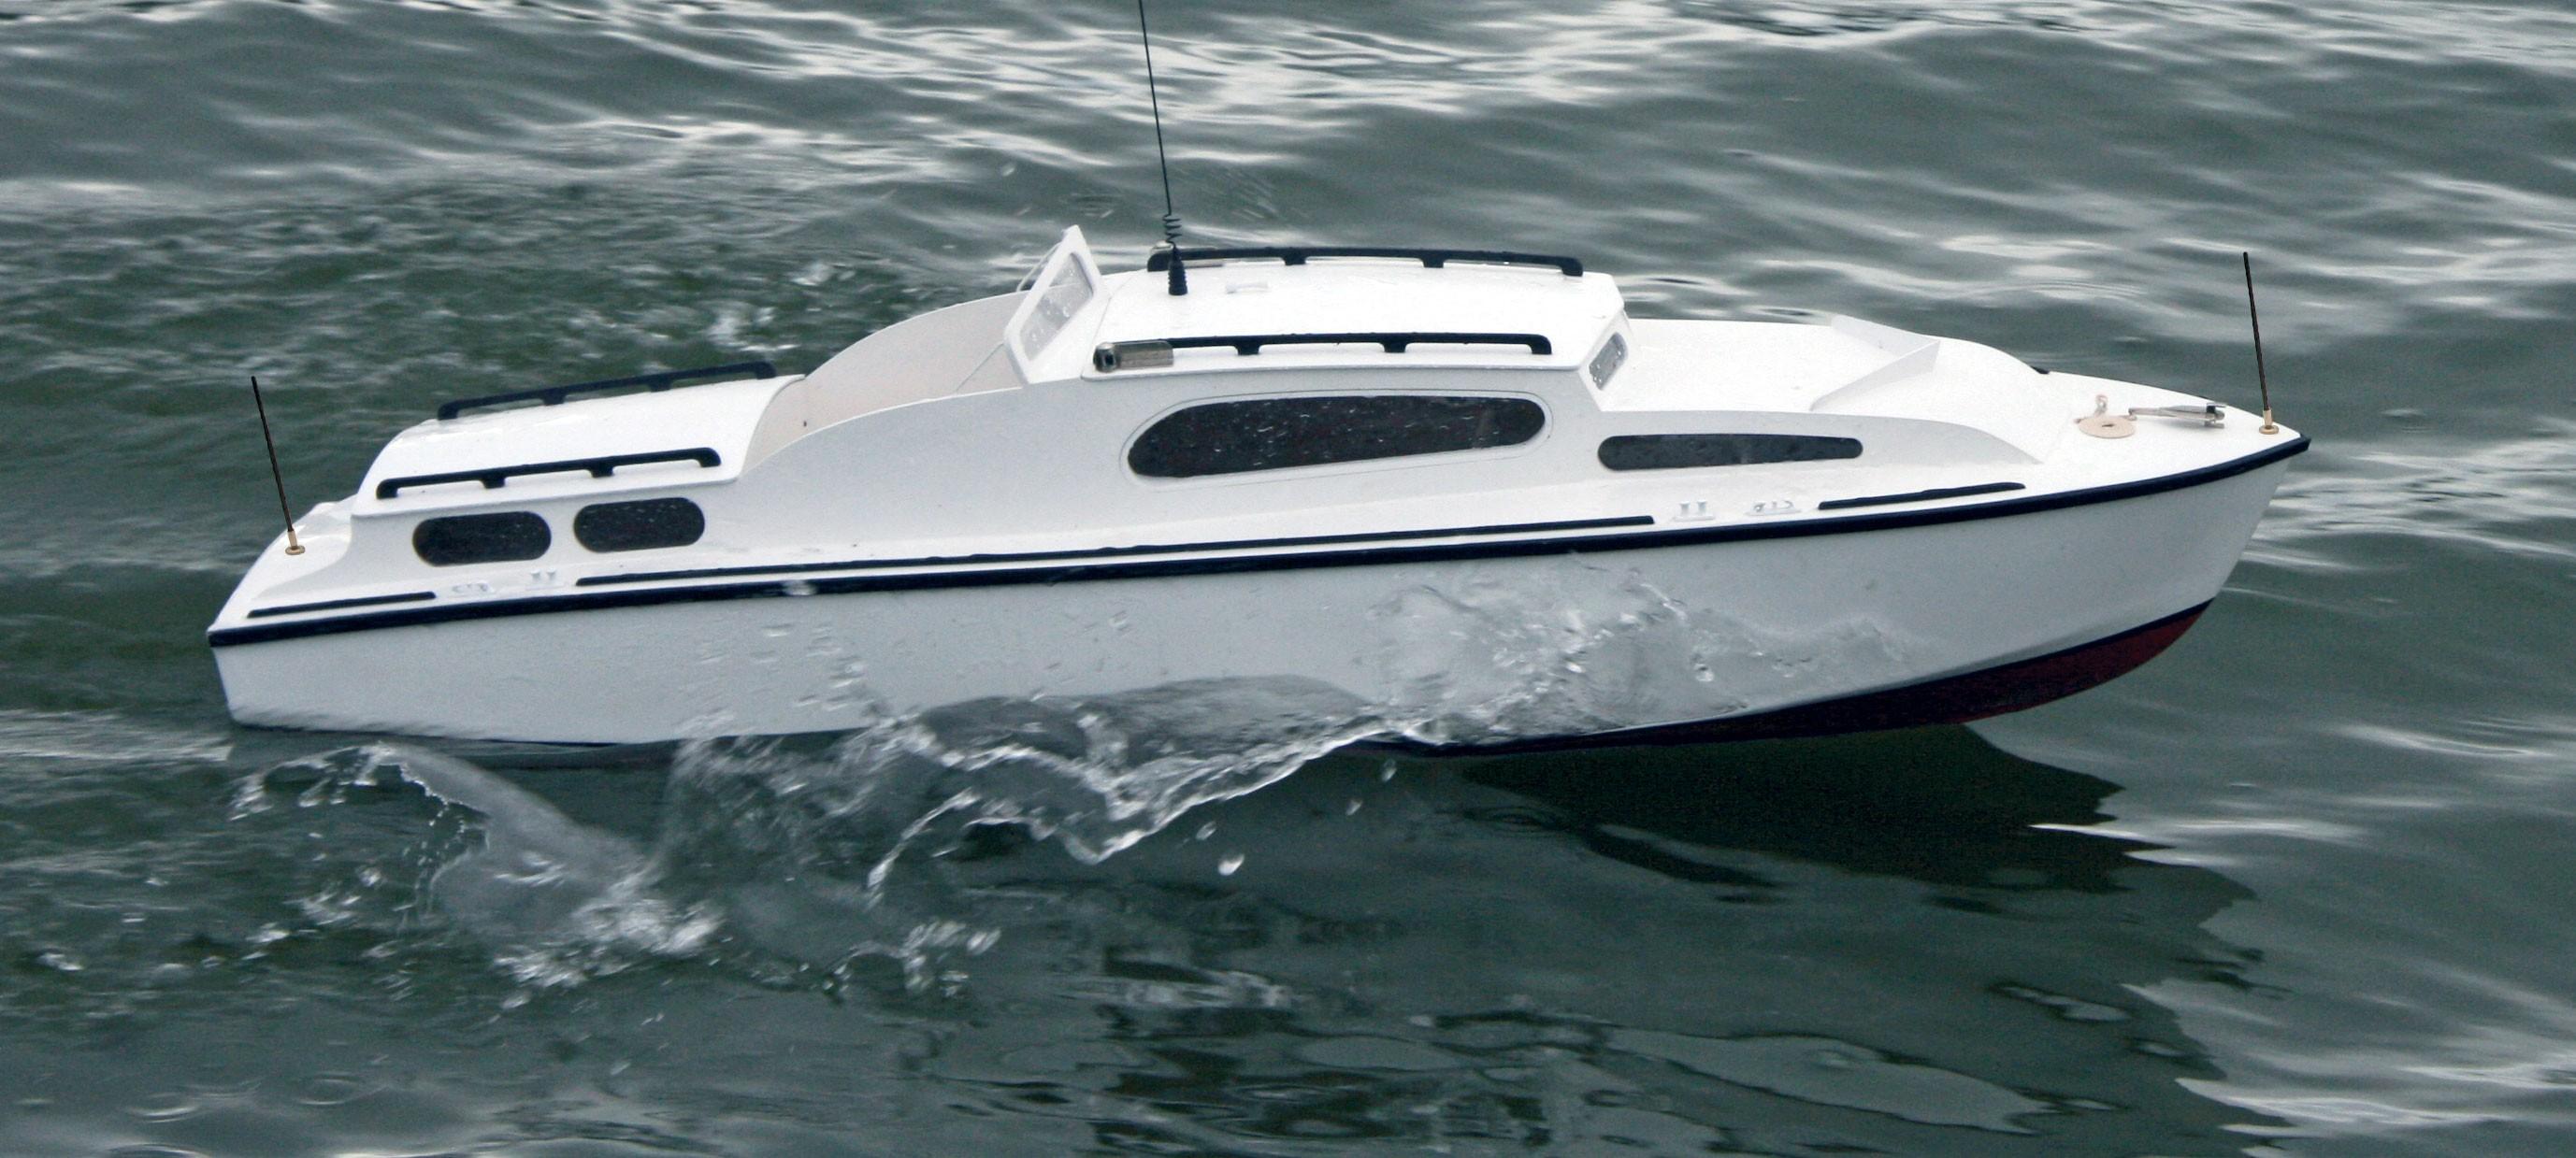 Sea Commander Cabin Cruiser (Caldercraft)